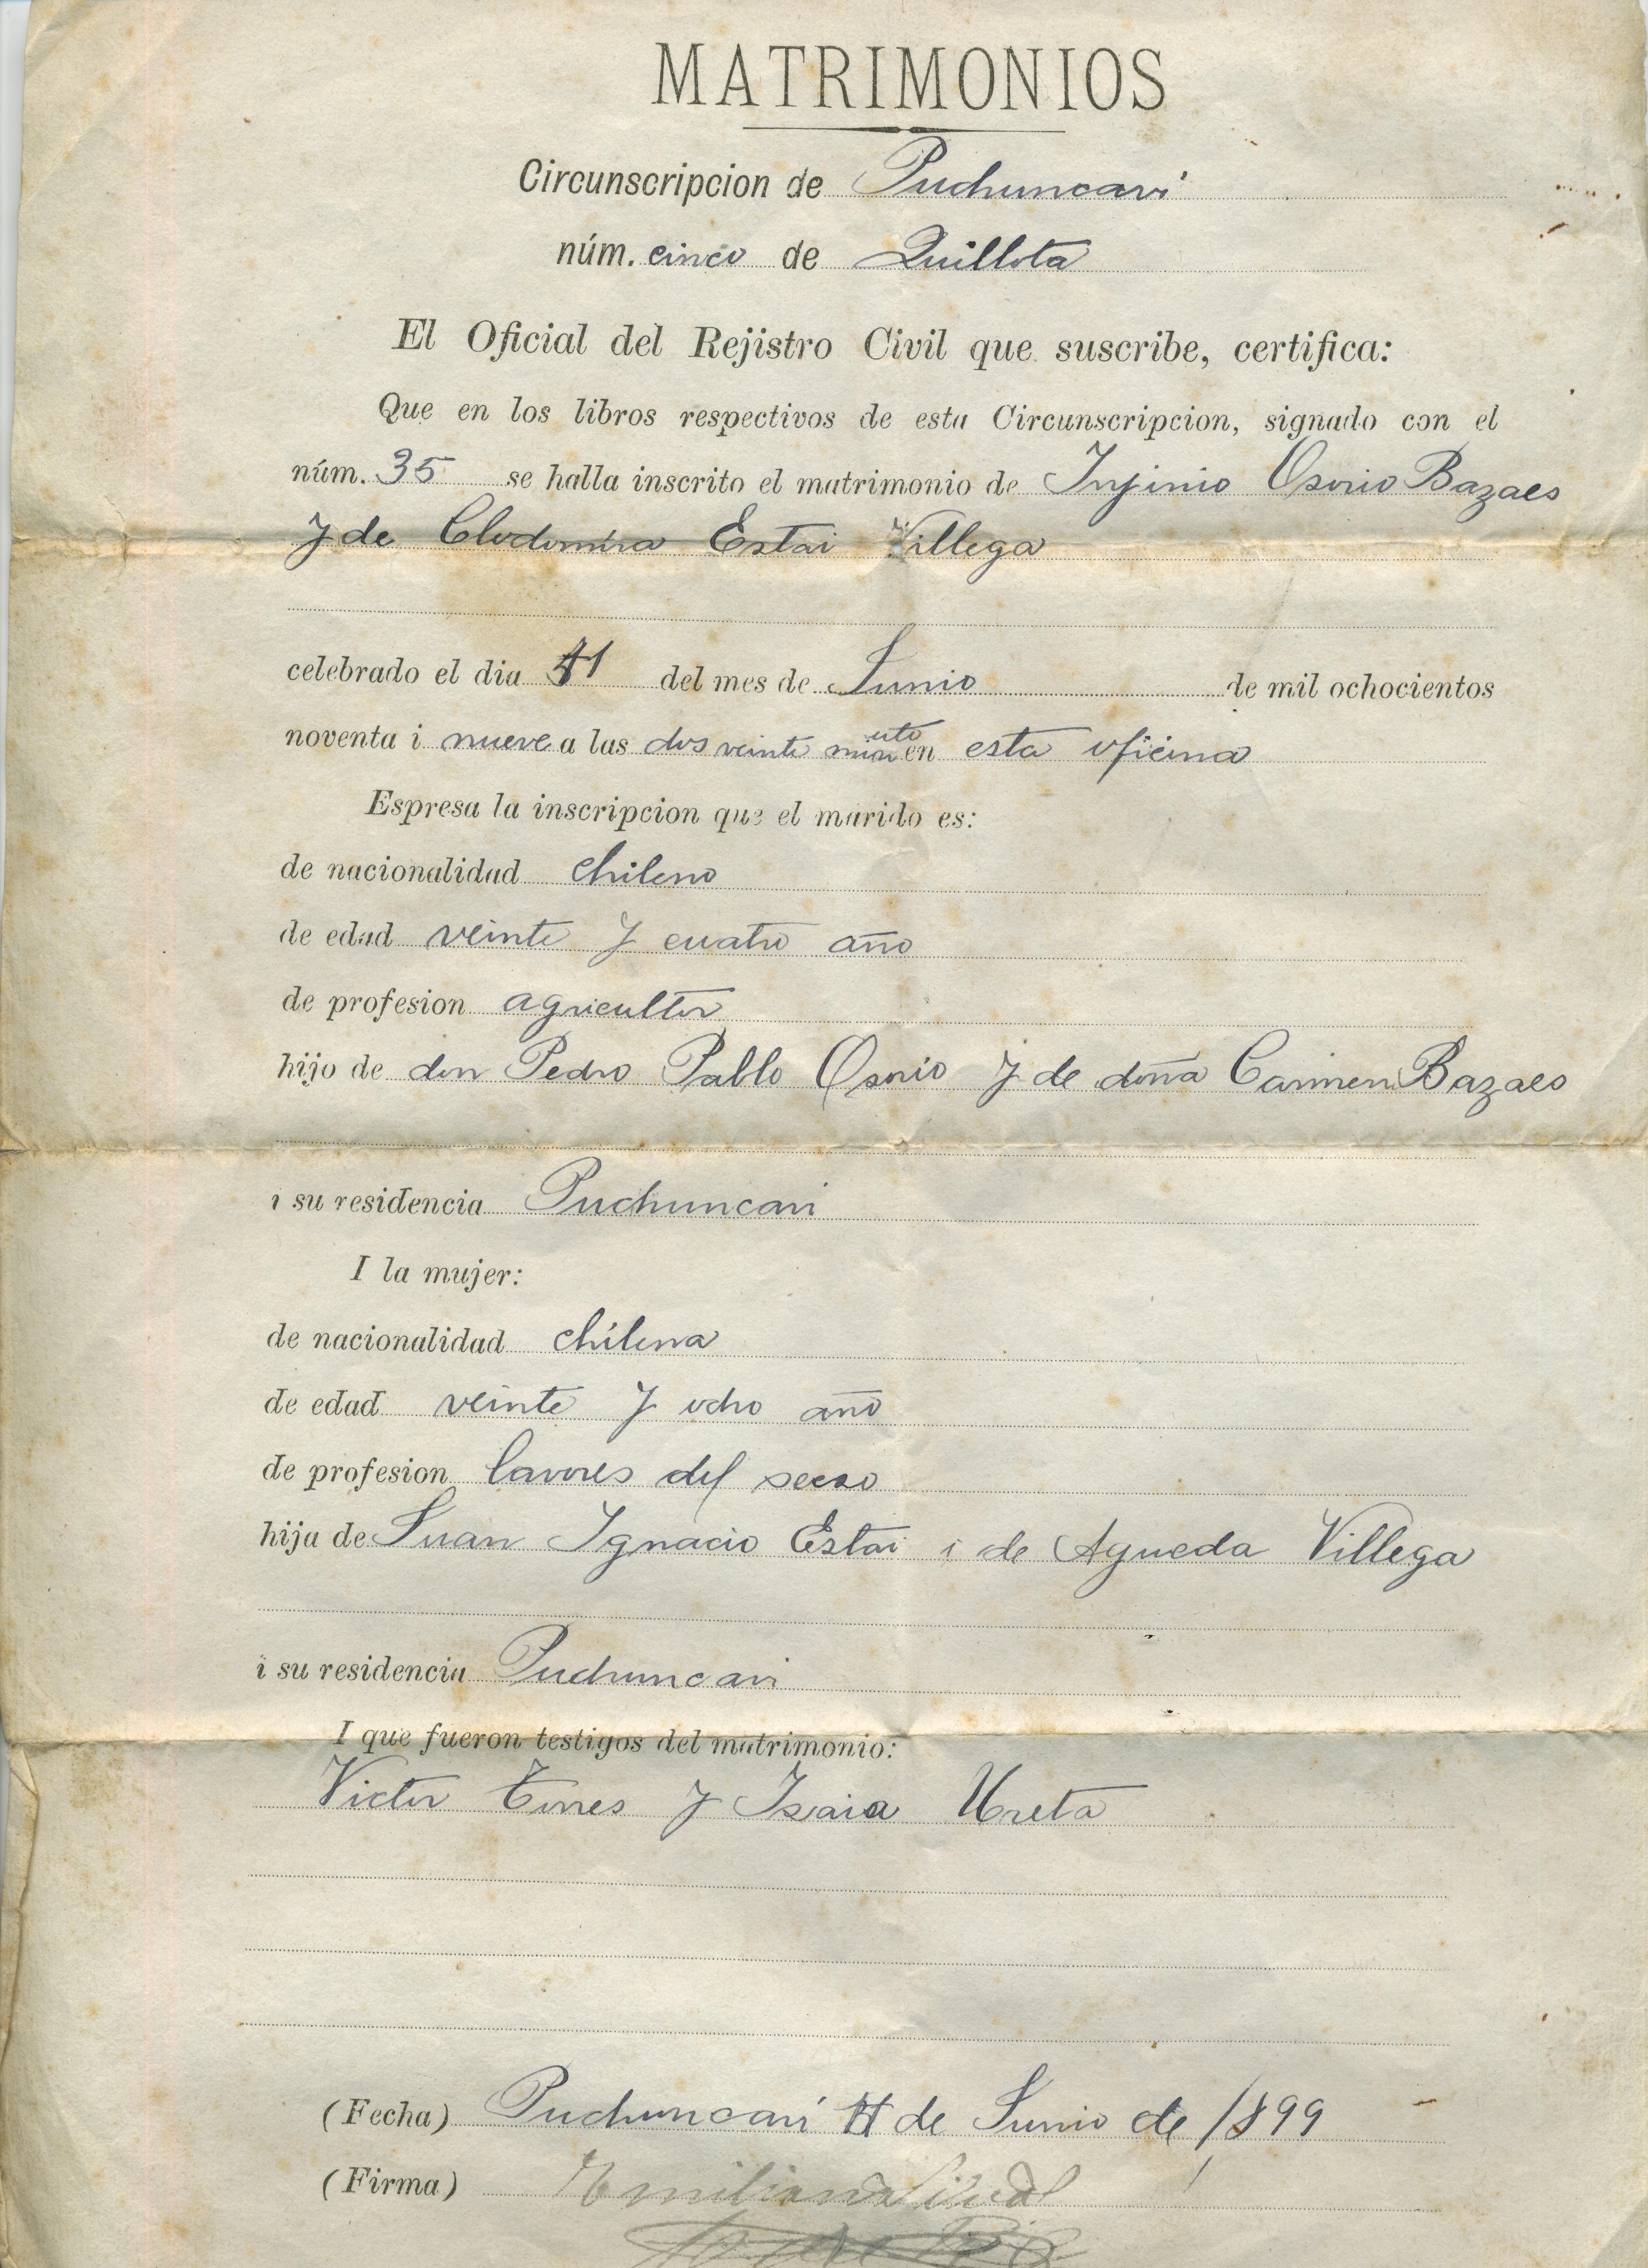 Certificado de matrimonio - Memorias del Siglo XX - Chile - DIBAM